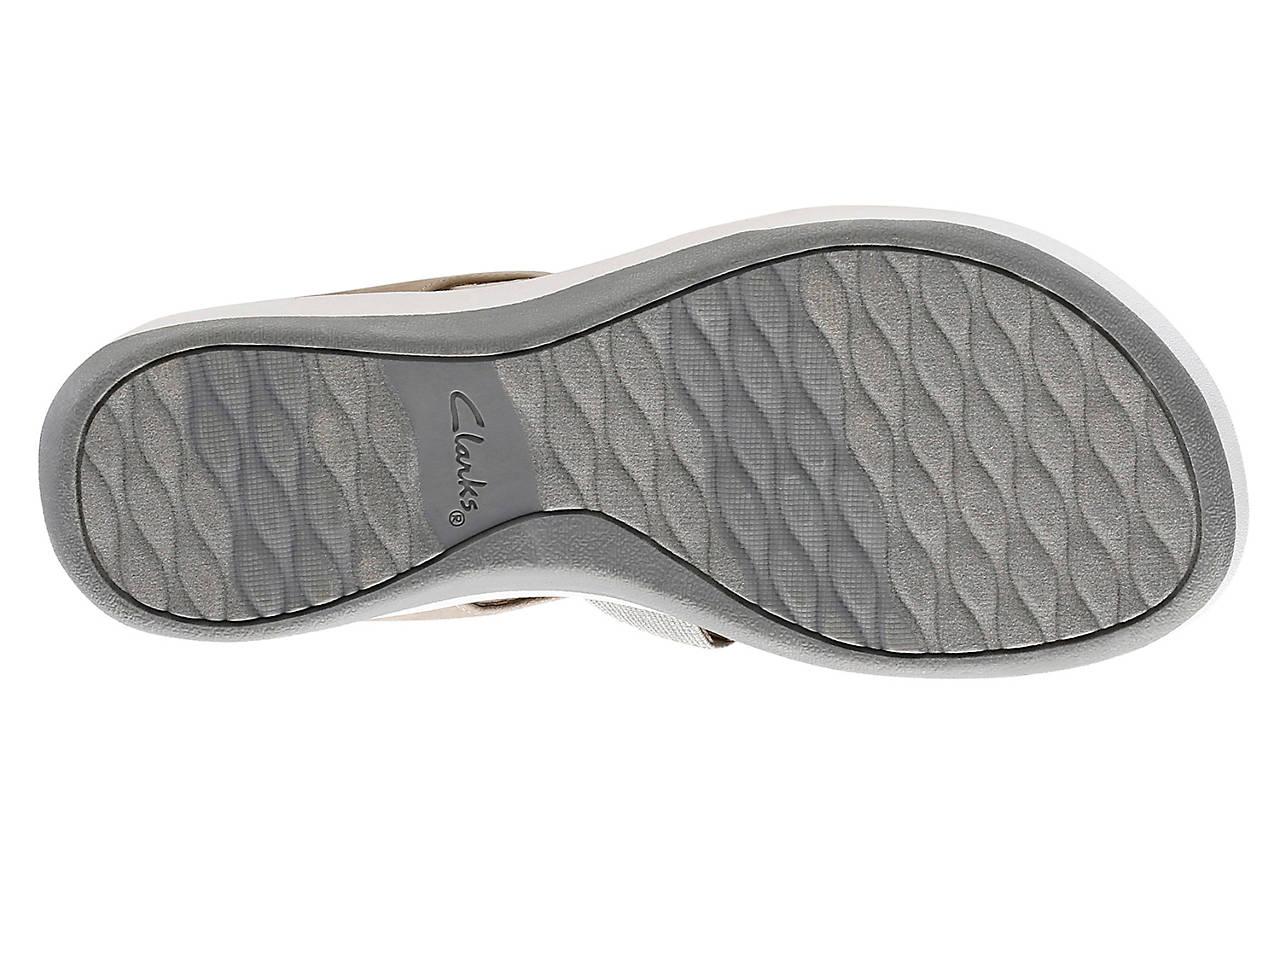 6743de9e327 Cloudsteppers by Clarks Arla Shaylie Wedge Sandal Women s Shoes